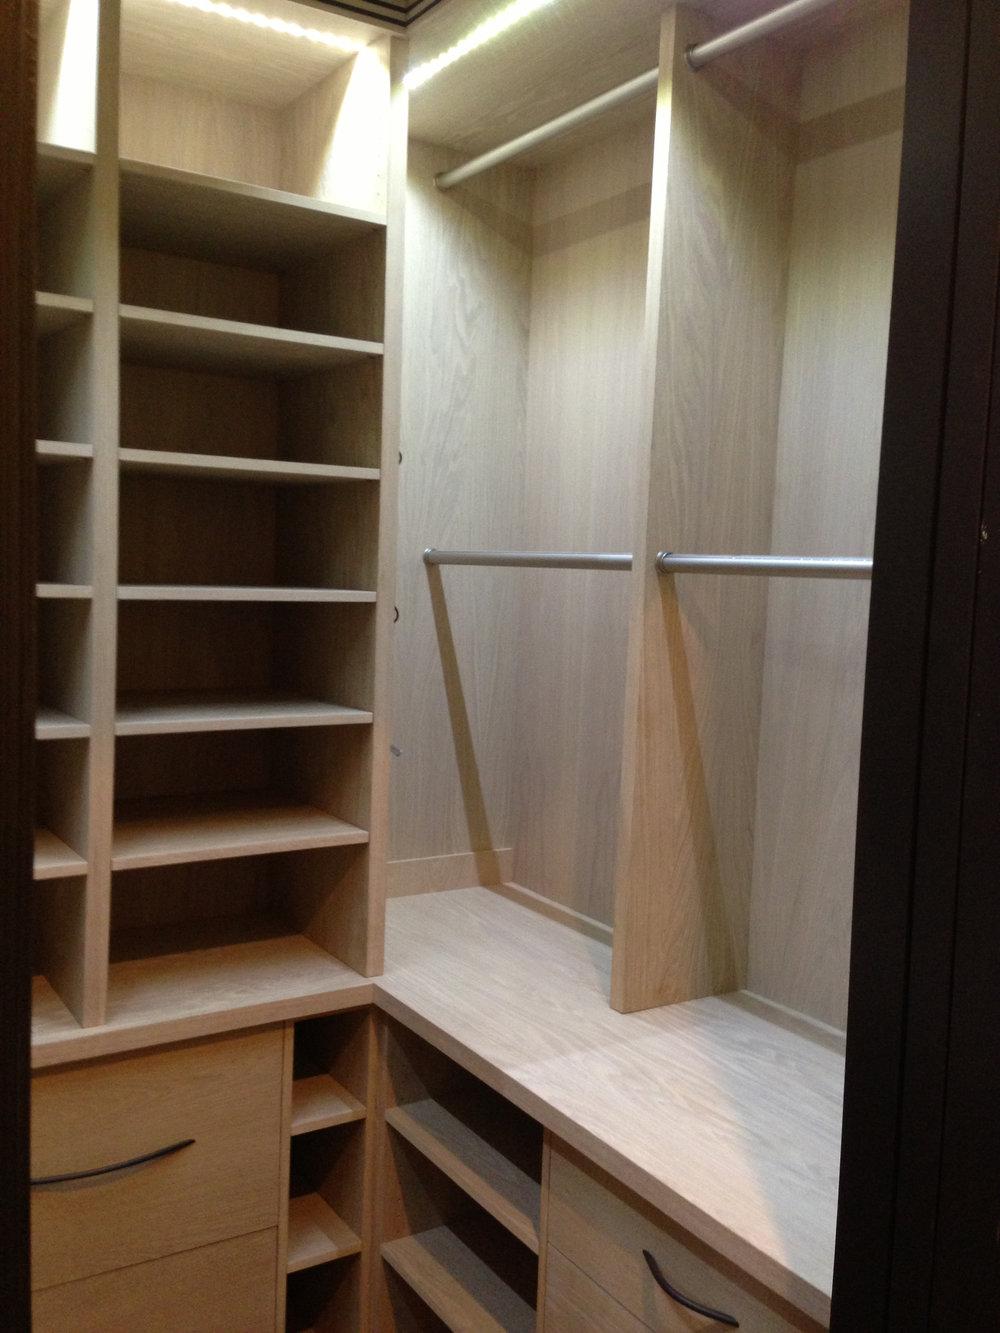 White-Oak-Closet-with-hanging-racks.jpg